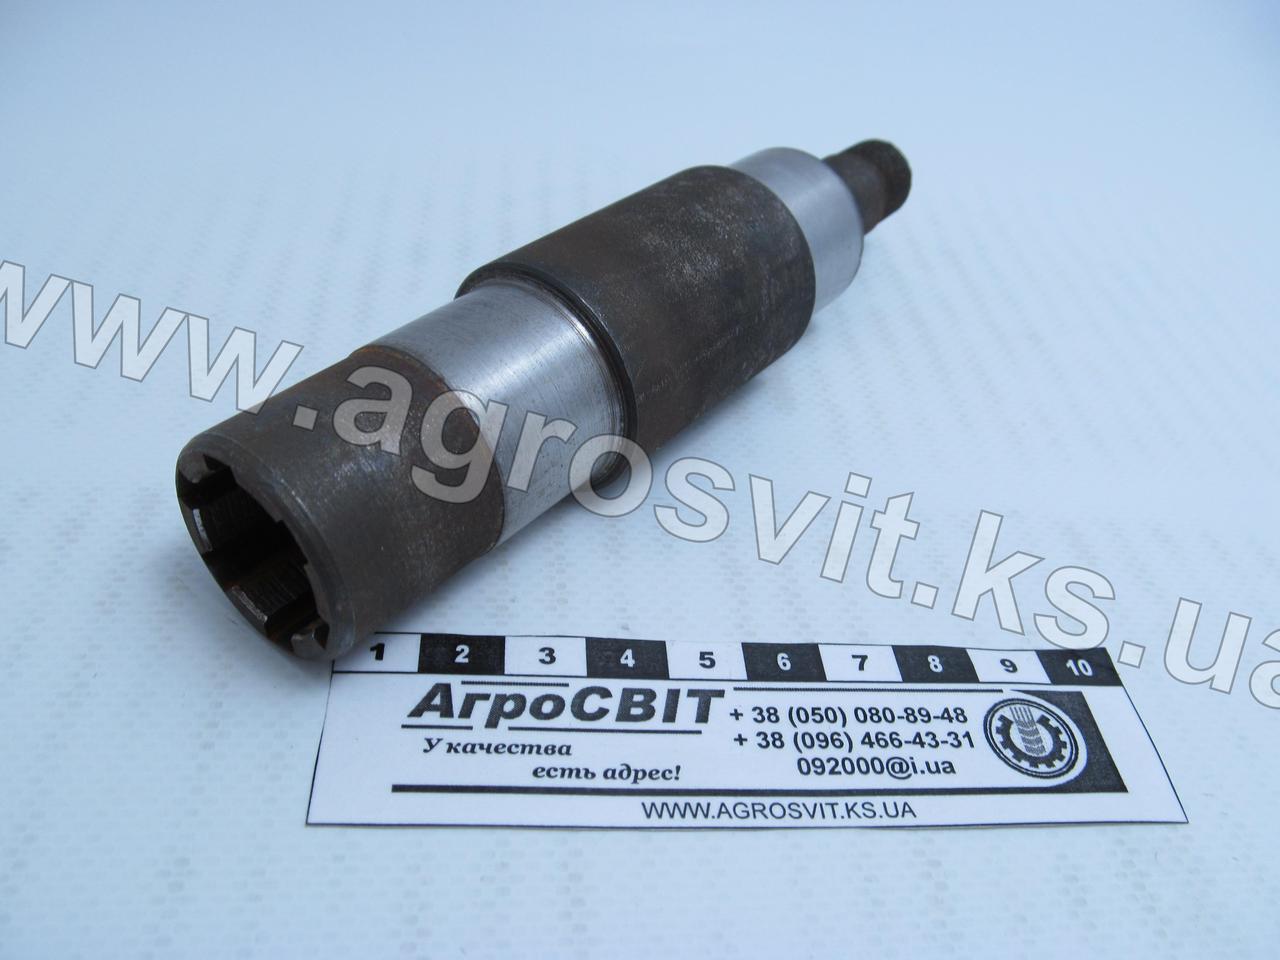 Втулка привода НШ-32 / НШ-50 (под подшипники)